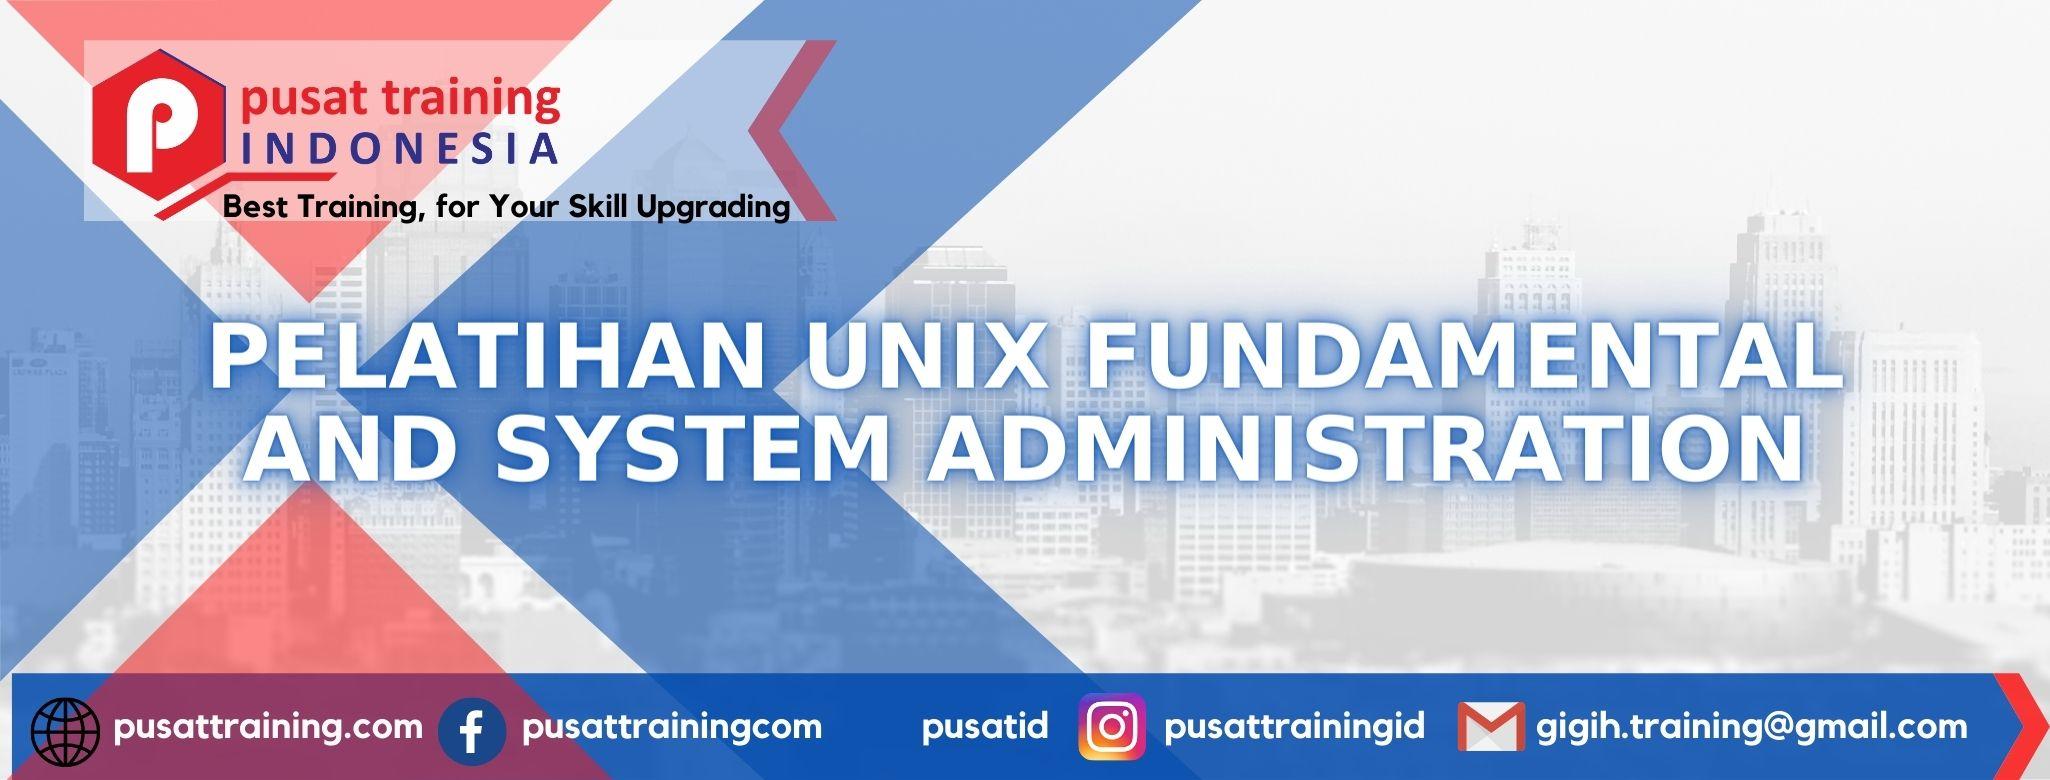 pelatihan-unix-fundamental-and-system-administration